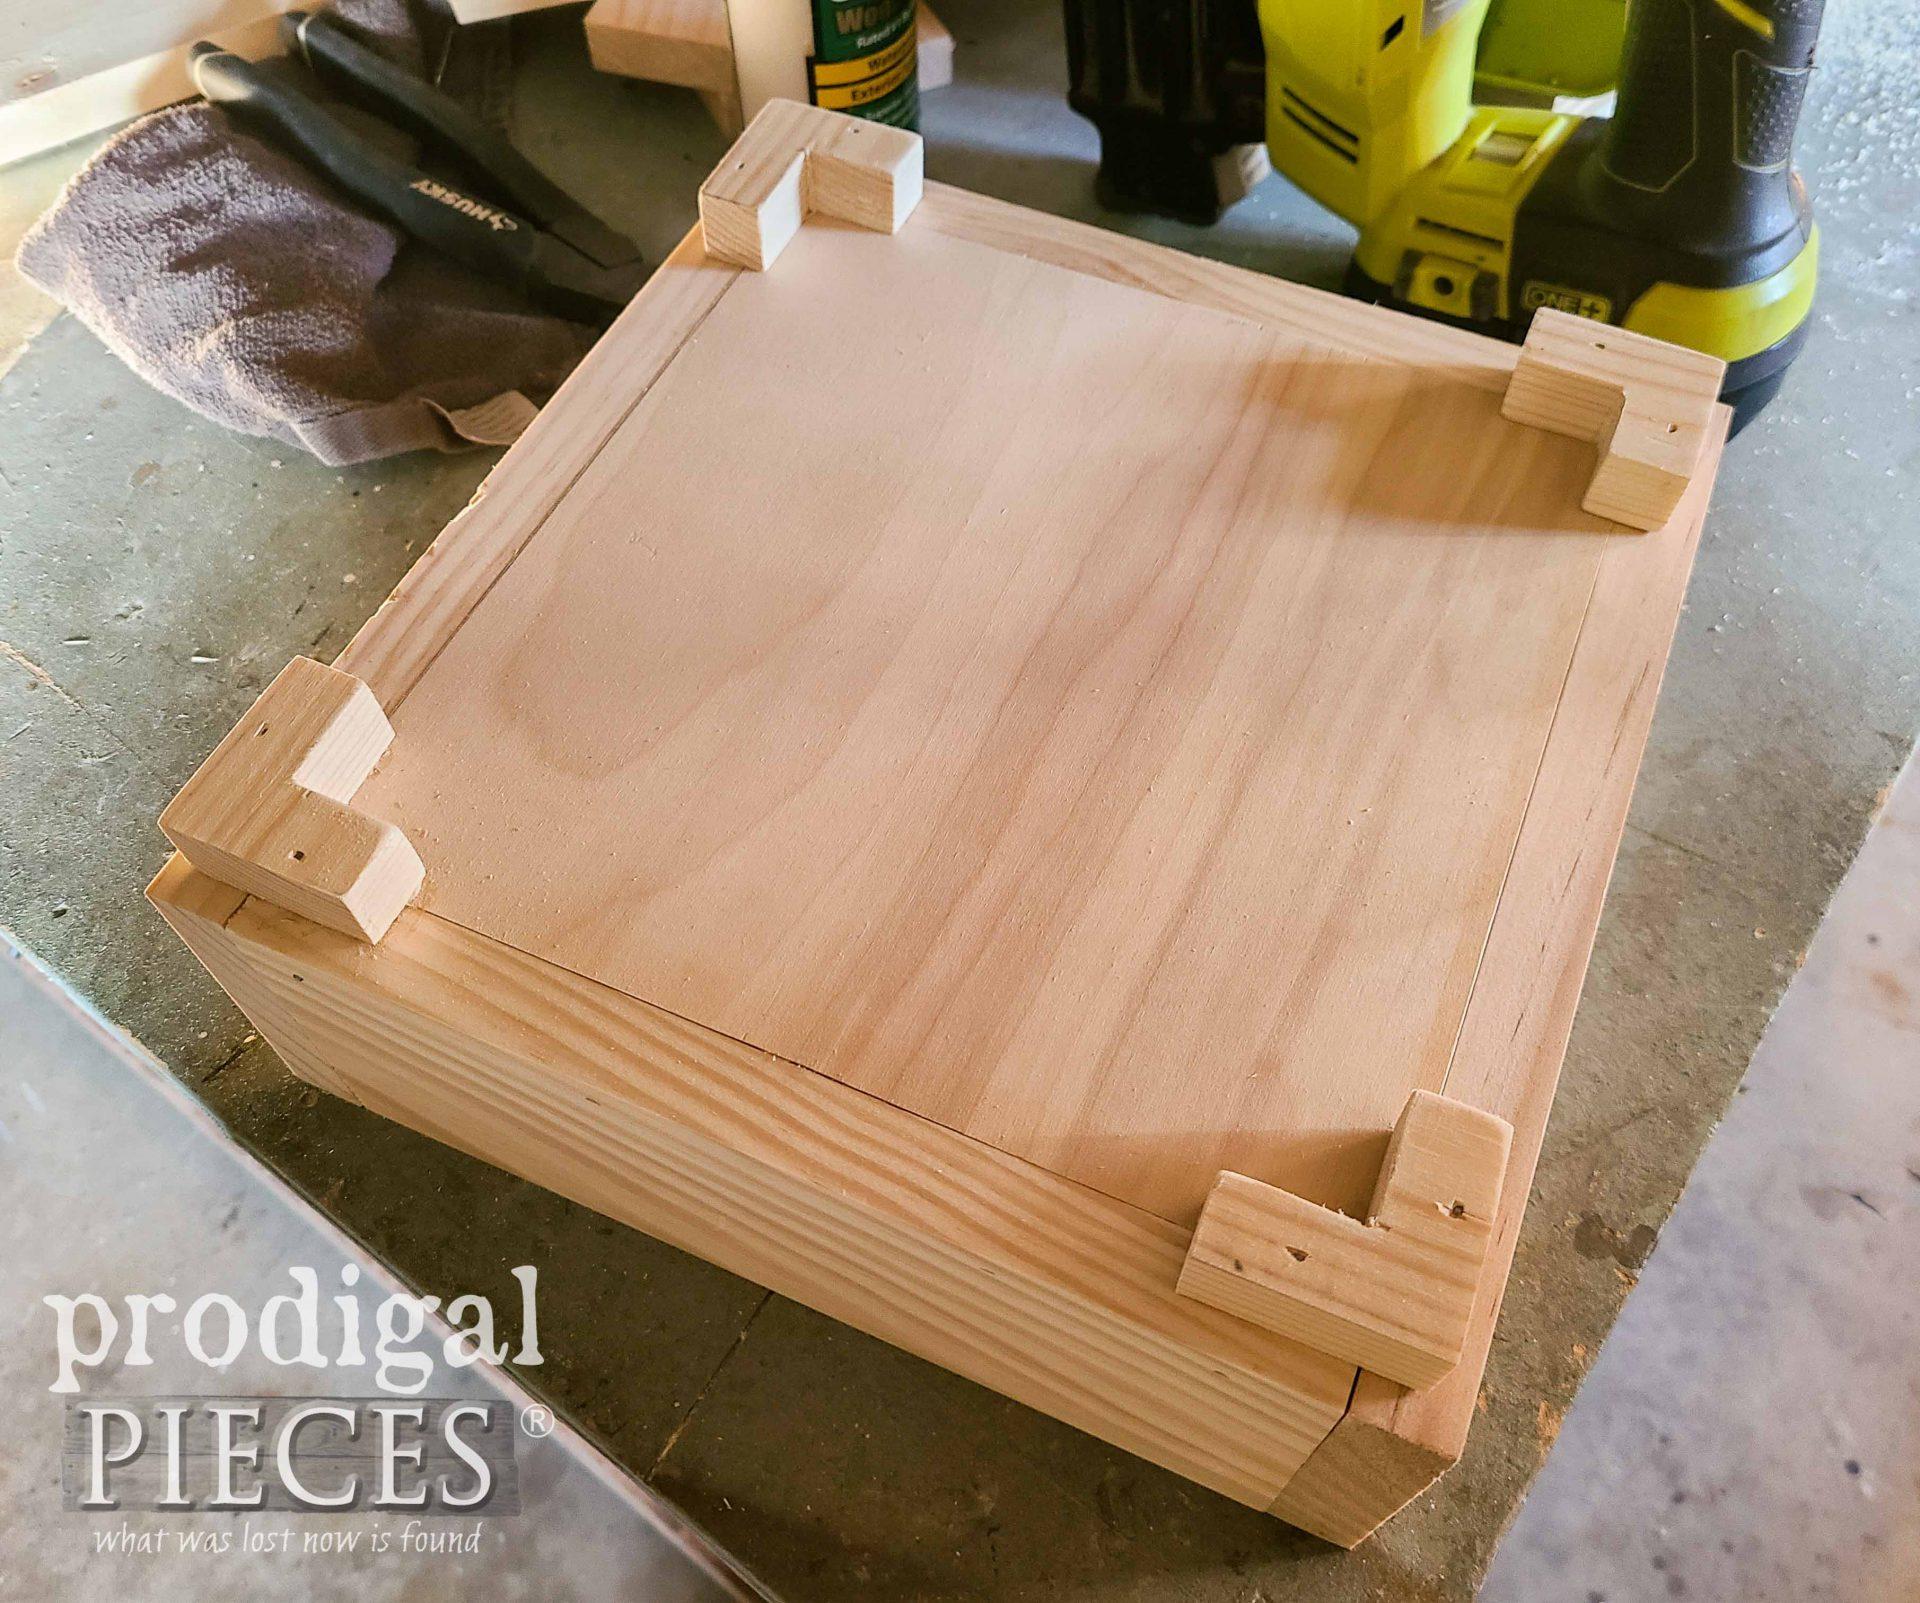 Attaching DIY Gift Box Feet | prodigalpieces.com #prodigalpieces